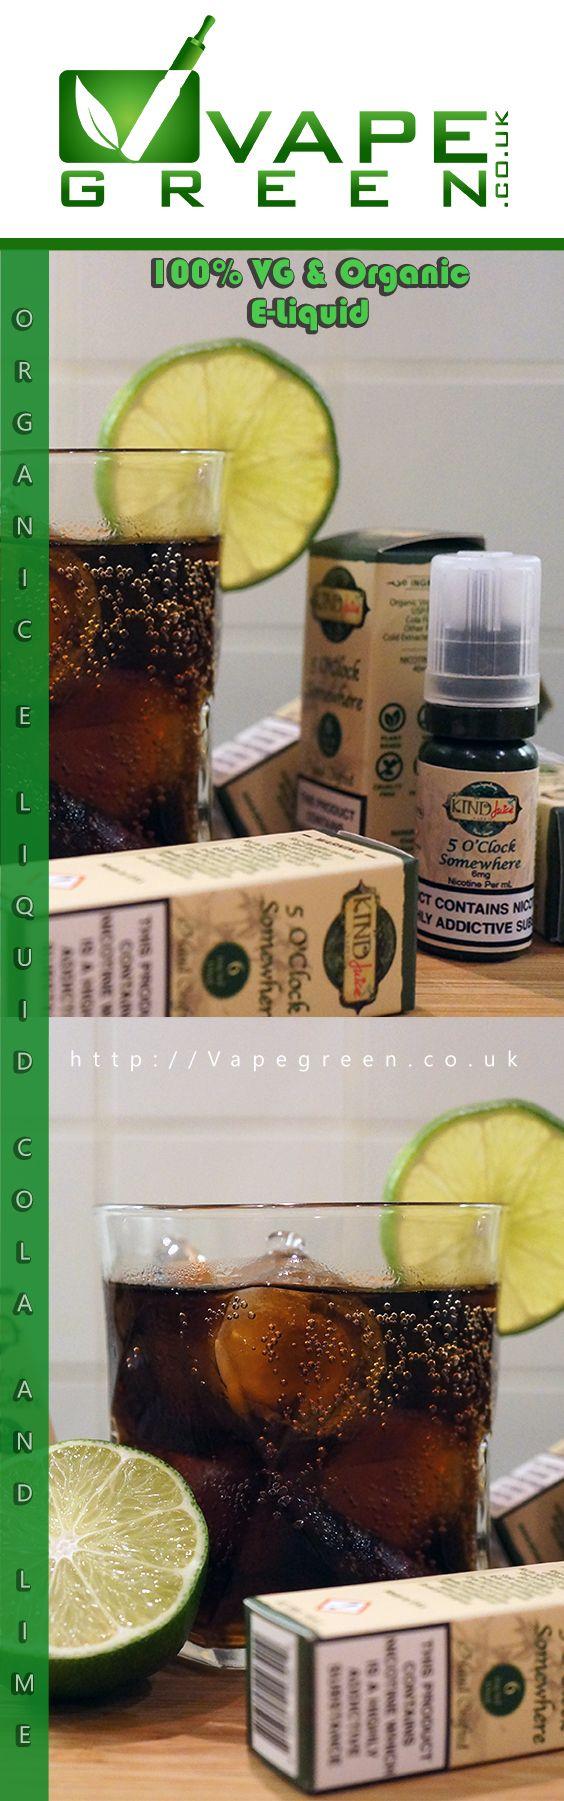 Super Tasty Cola and Lime e-liquid from Kind Juice, 100% VG and Organic Flavoured. Buy now at VapeGreen.co.uk #vape #vaping #eliquid #ejuice #ecig #kindjuice #vapegreen #vapeuk #ukvapers #vapefam #cola #lime #organic #100vg